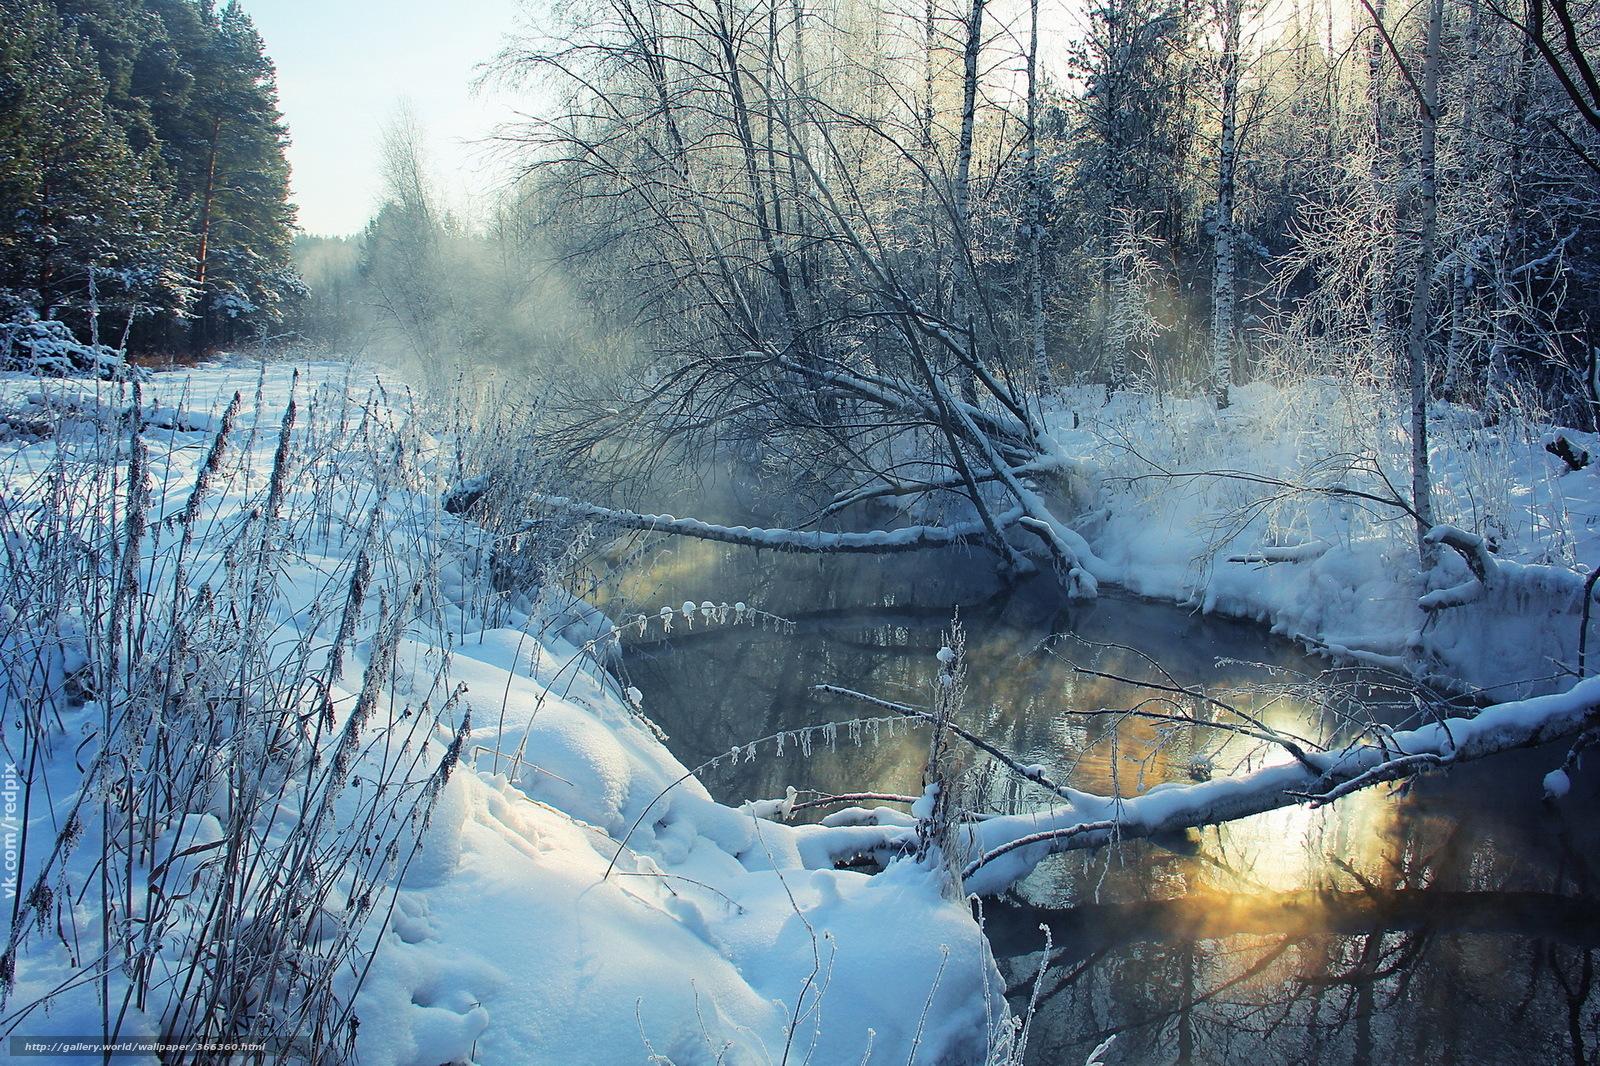 Tlcharger fond d 39 ecran hiver rivire nature paysage for Fond ecran iphone paysage